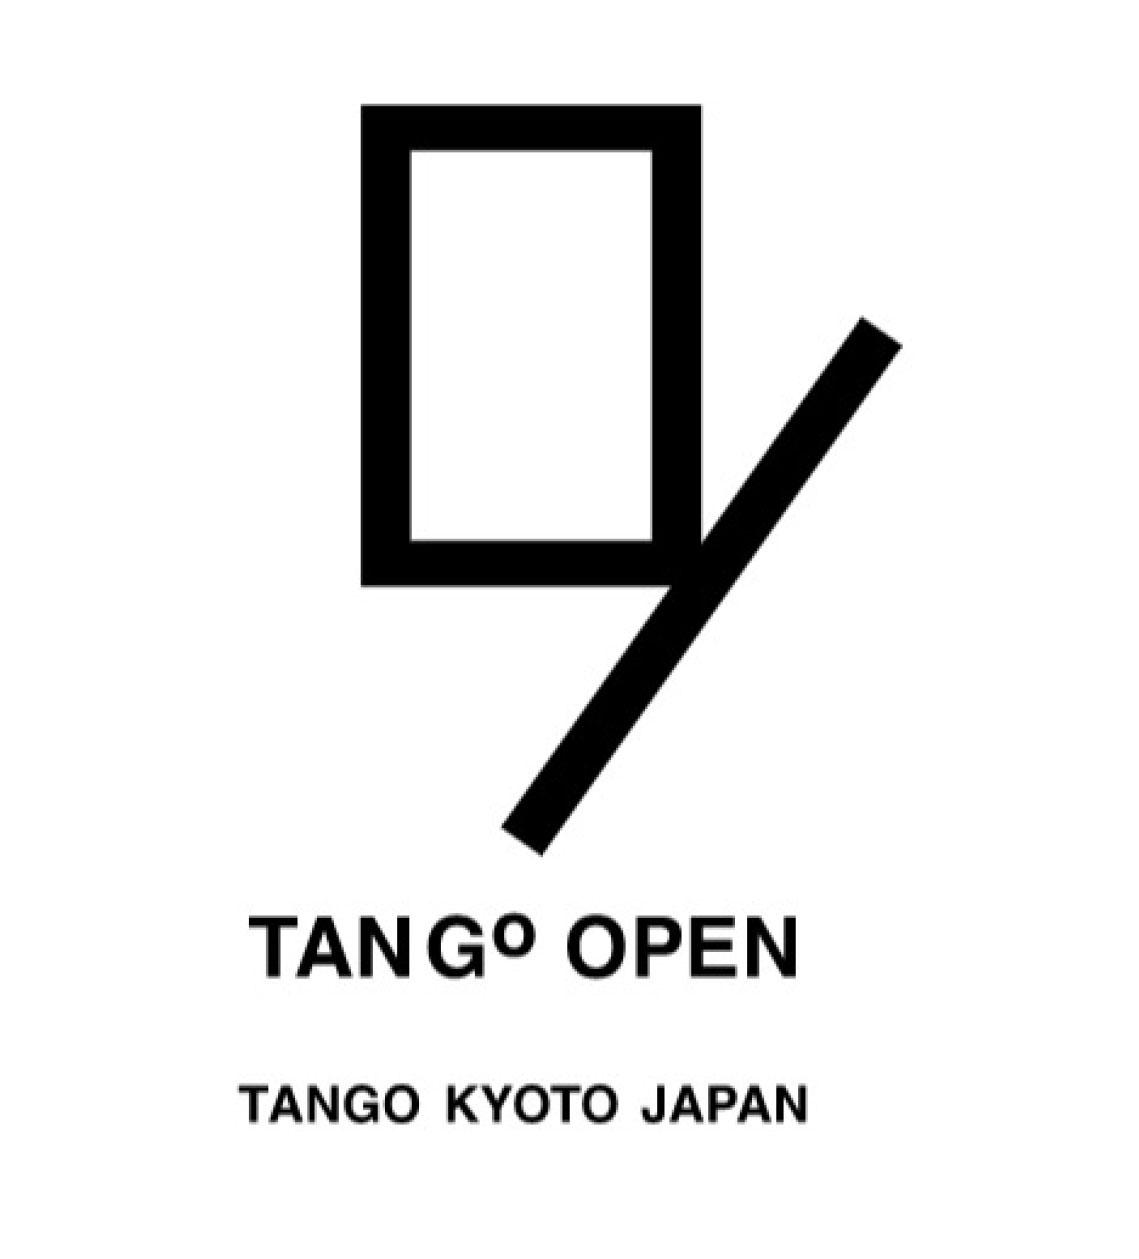 TANGO OPEN